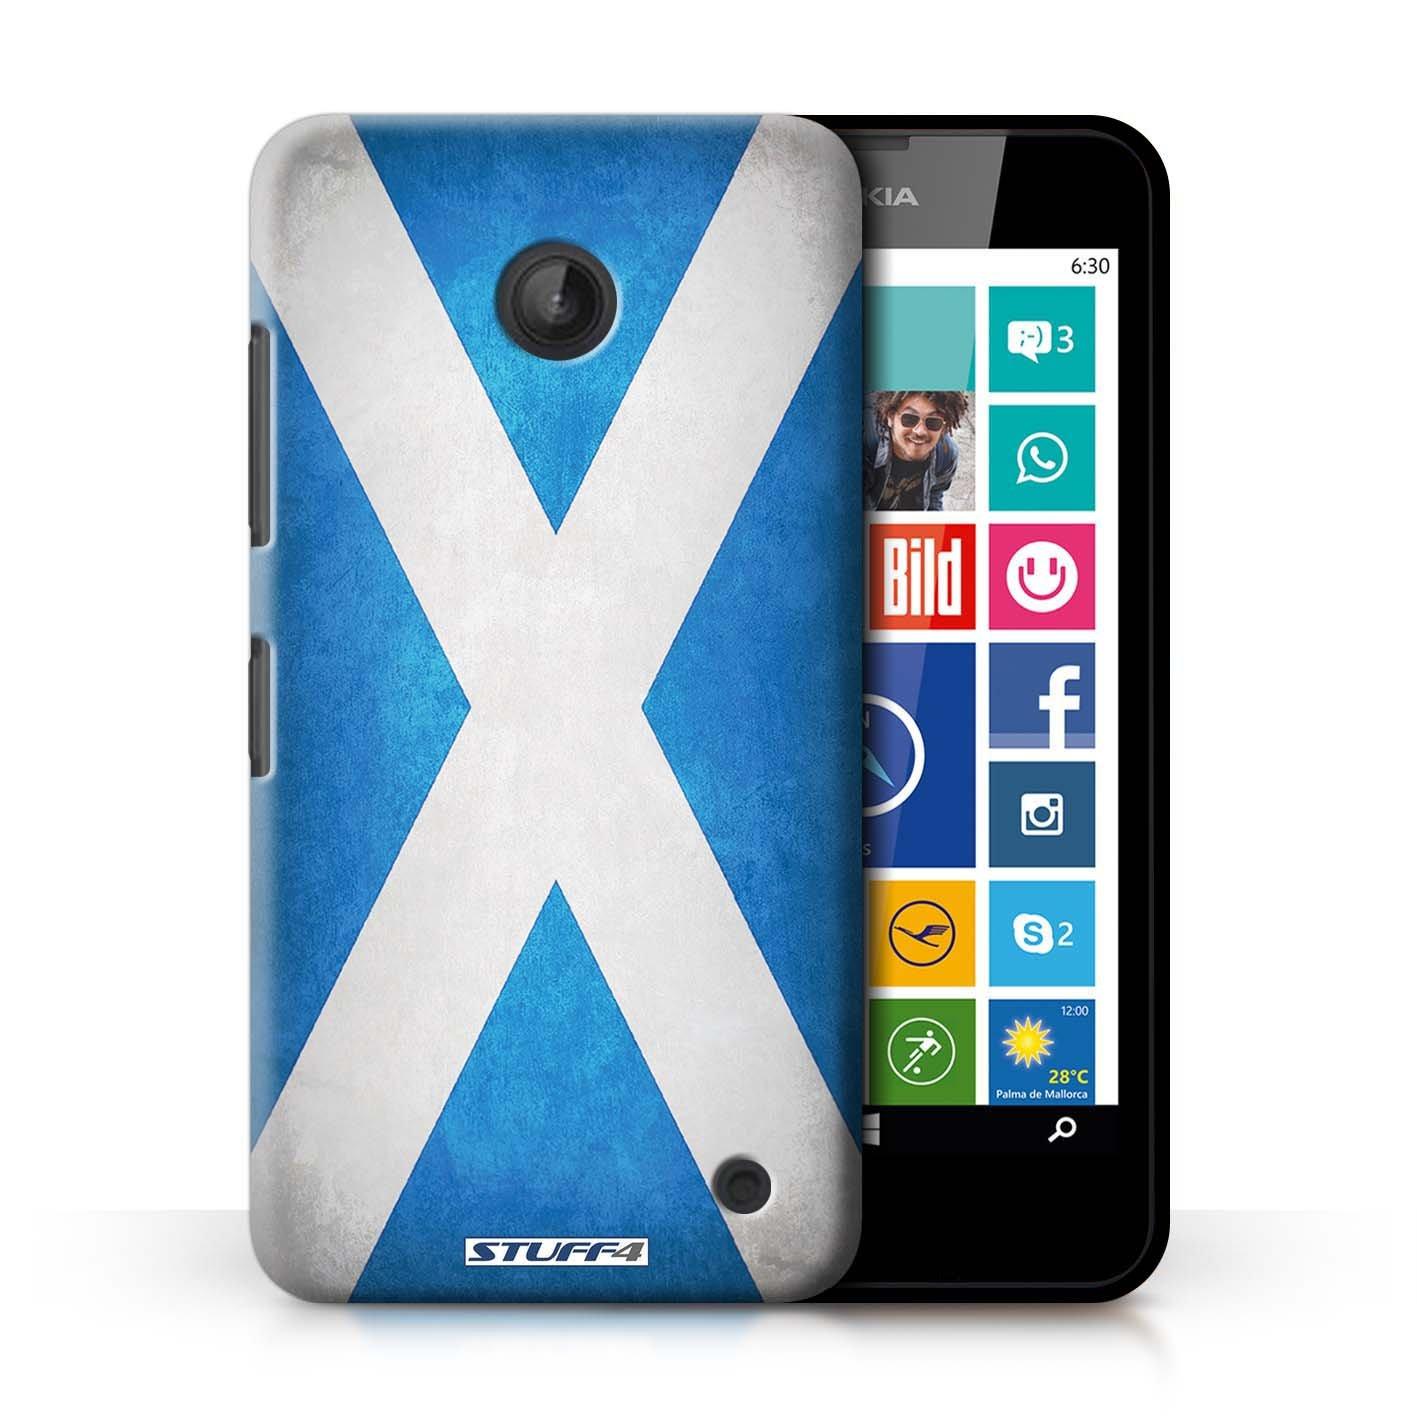 Carcasa/Funda STUFF4 dura para el Nokia Lumia 635 / serie ...